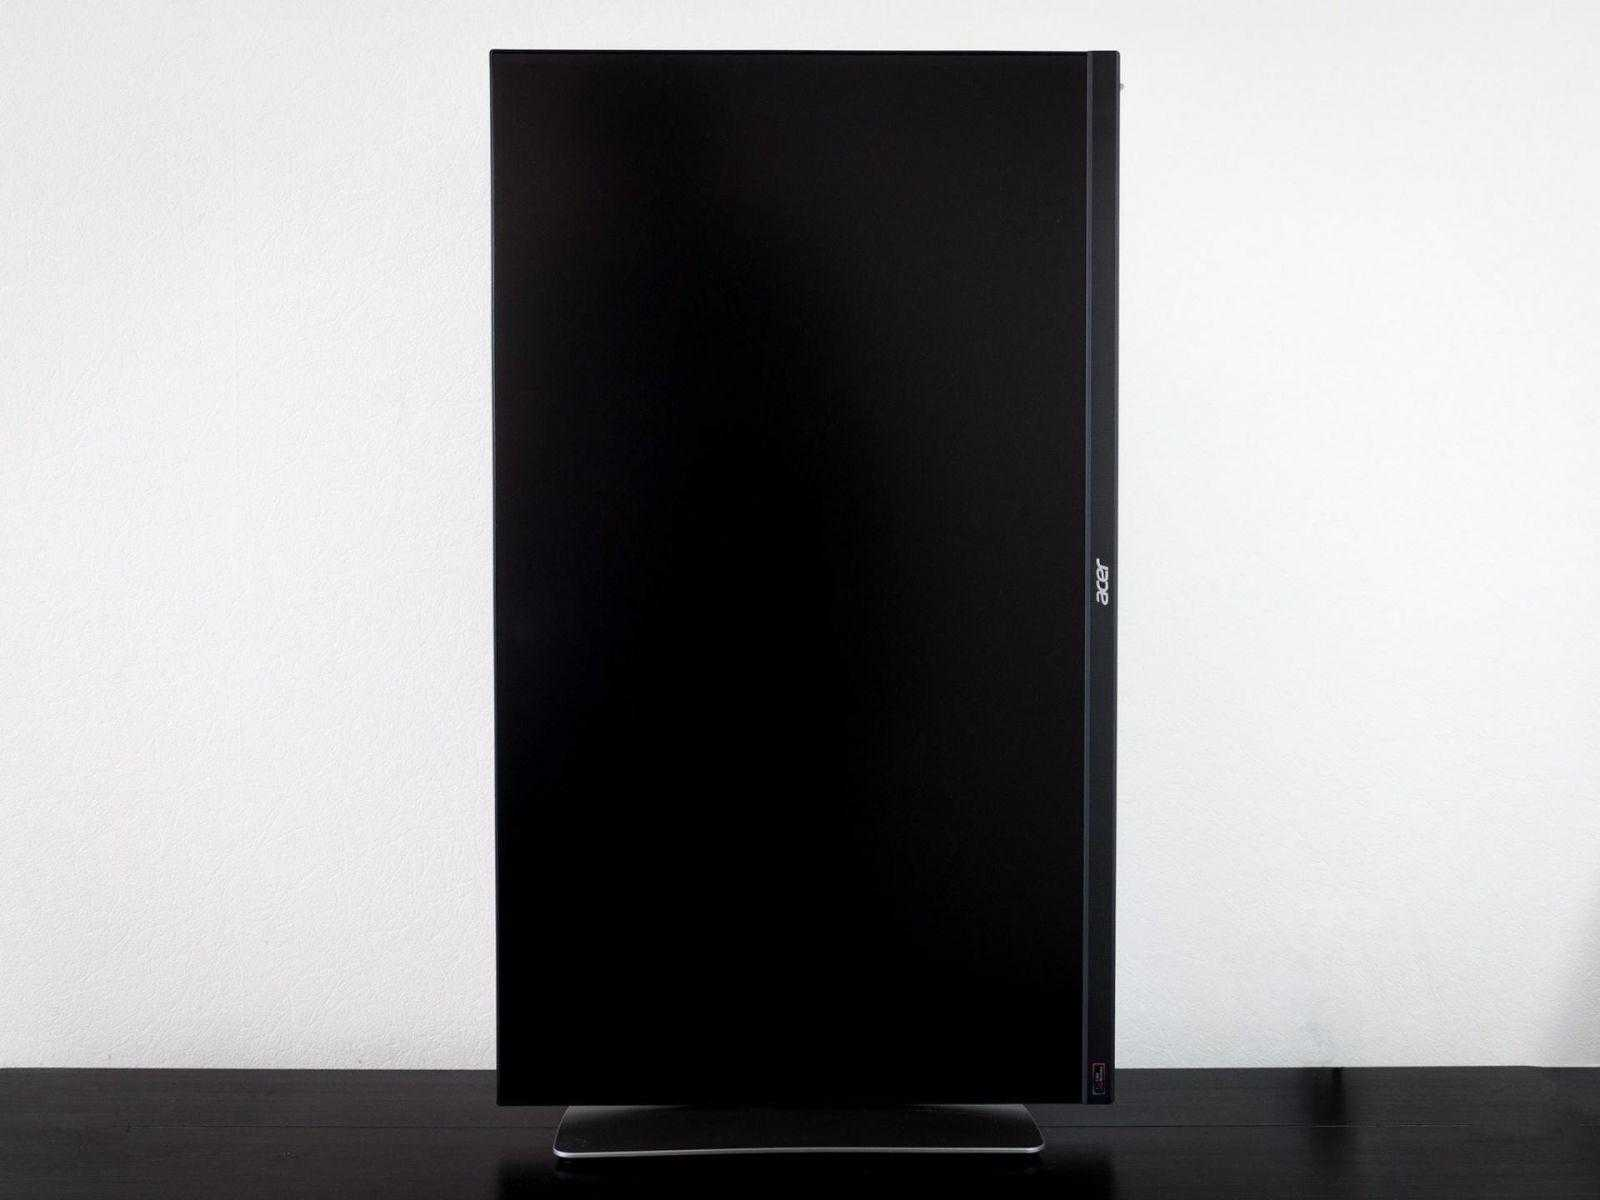 acer 320YaM04 - Обзор монитора Acer ProDesigner BM320